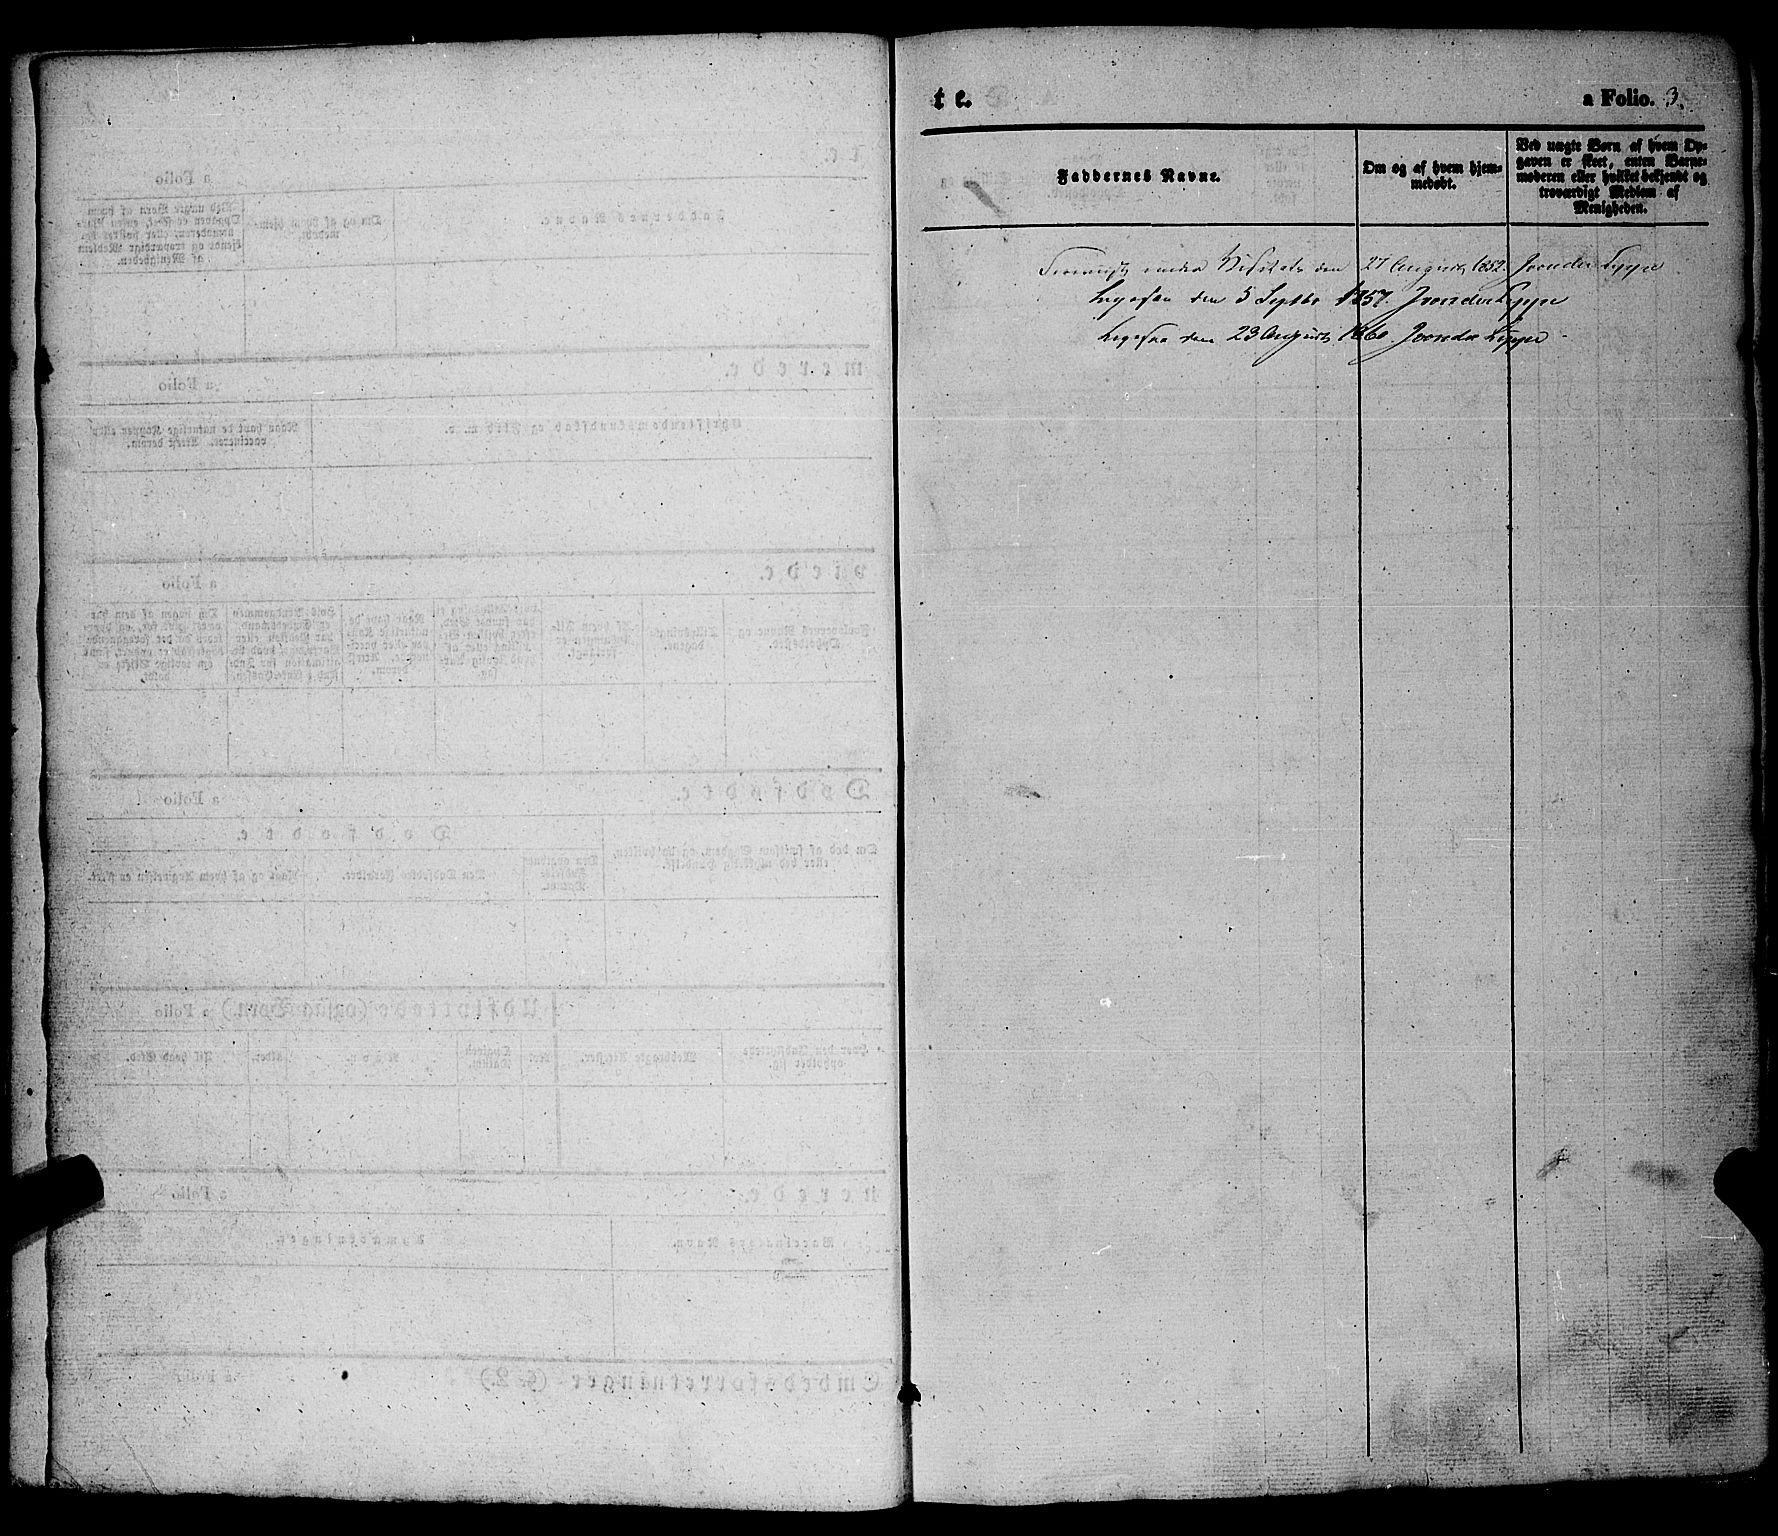 SAKO, Hjartdal kirkebøker, F/Fa/L0008: Ministerialbok nr. I 8, 1844-1859, s. 3